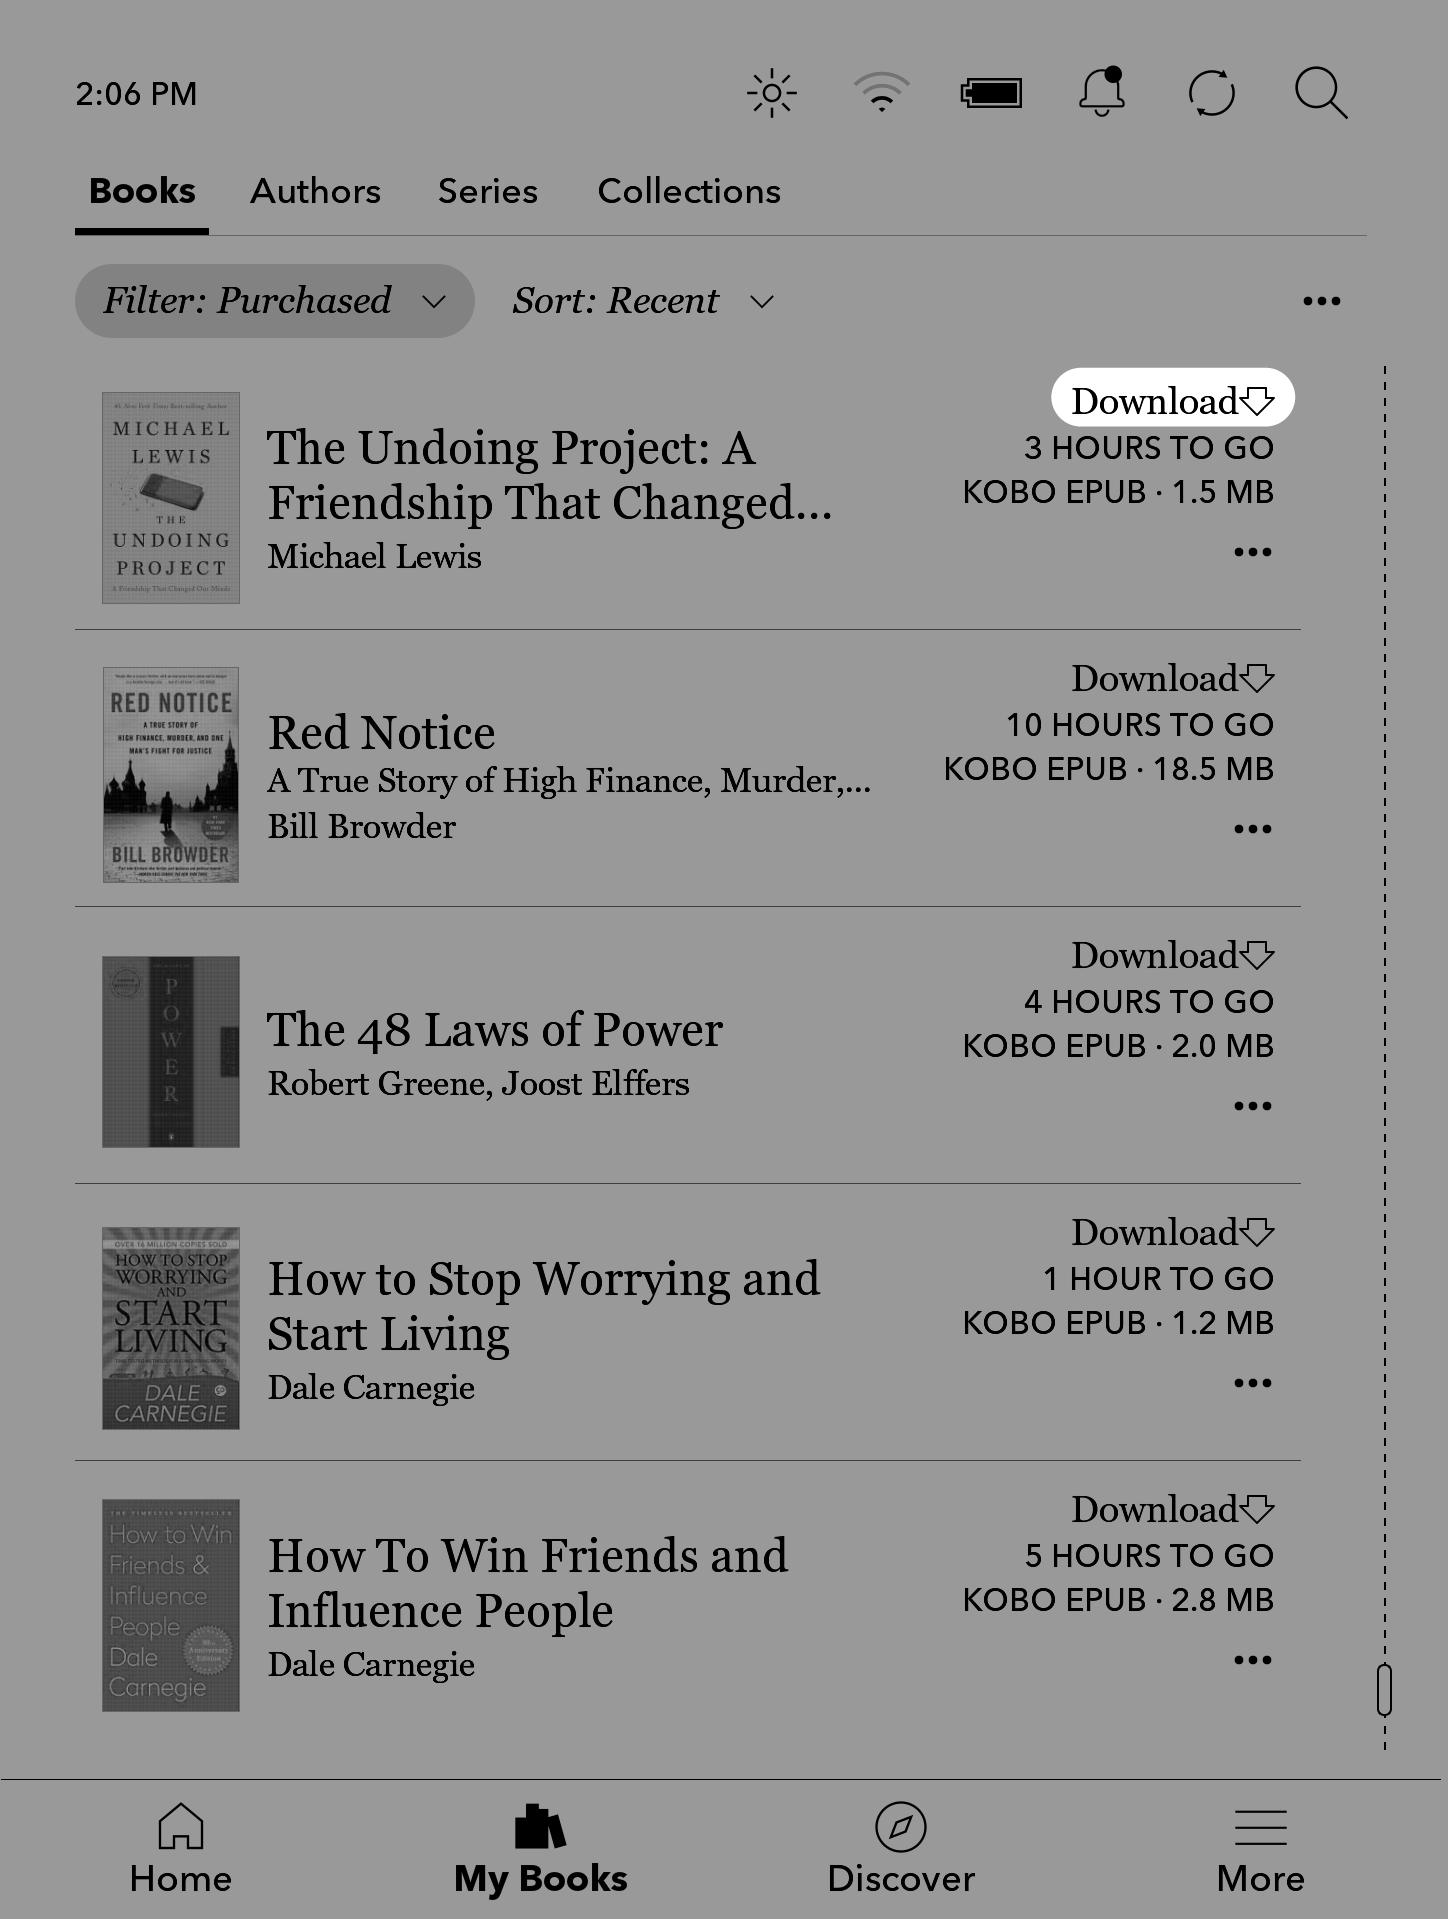 Download_-_Meine_Bücher_callout-01.png